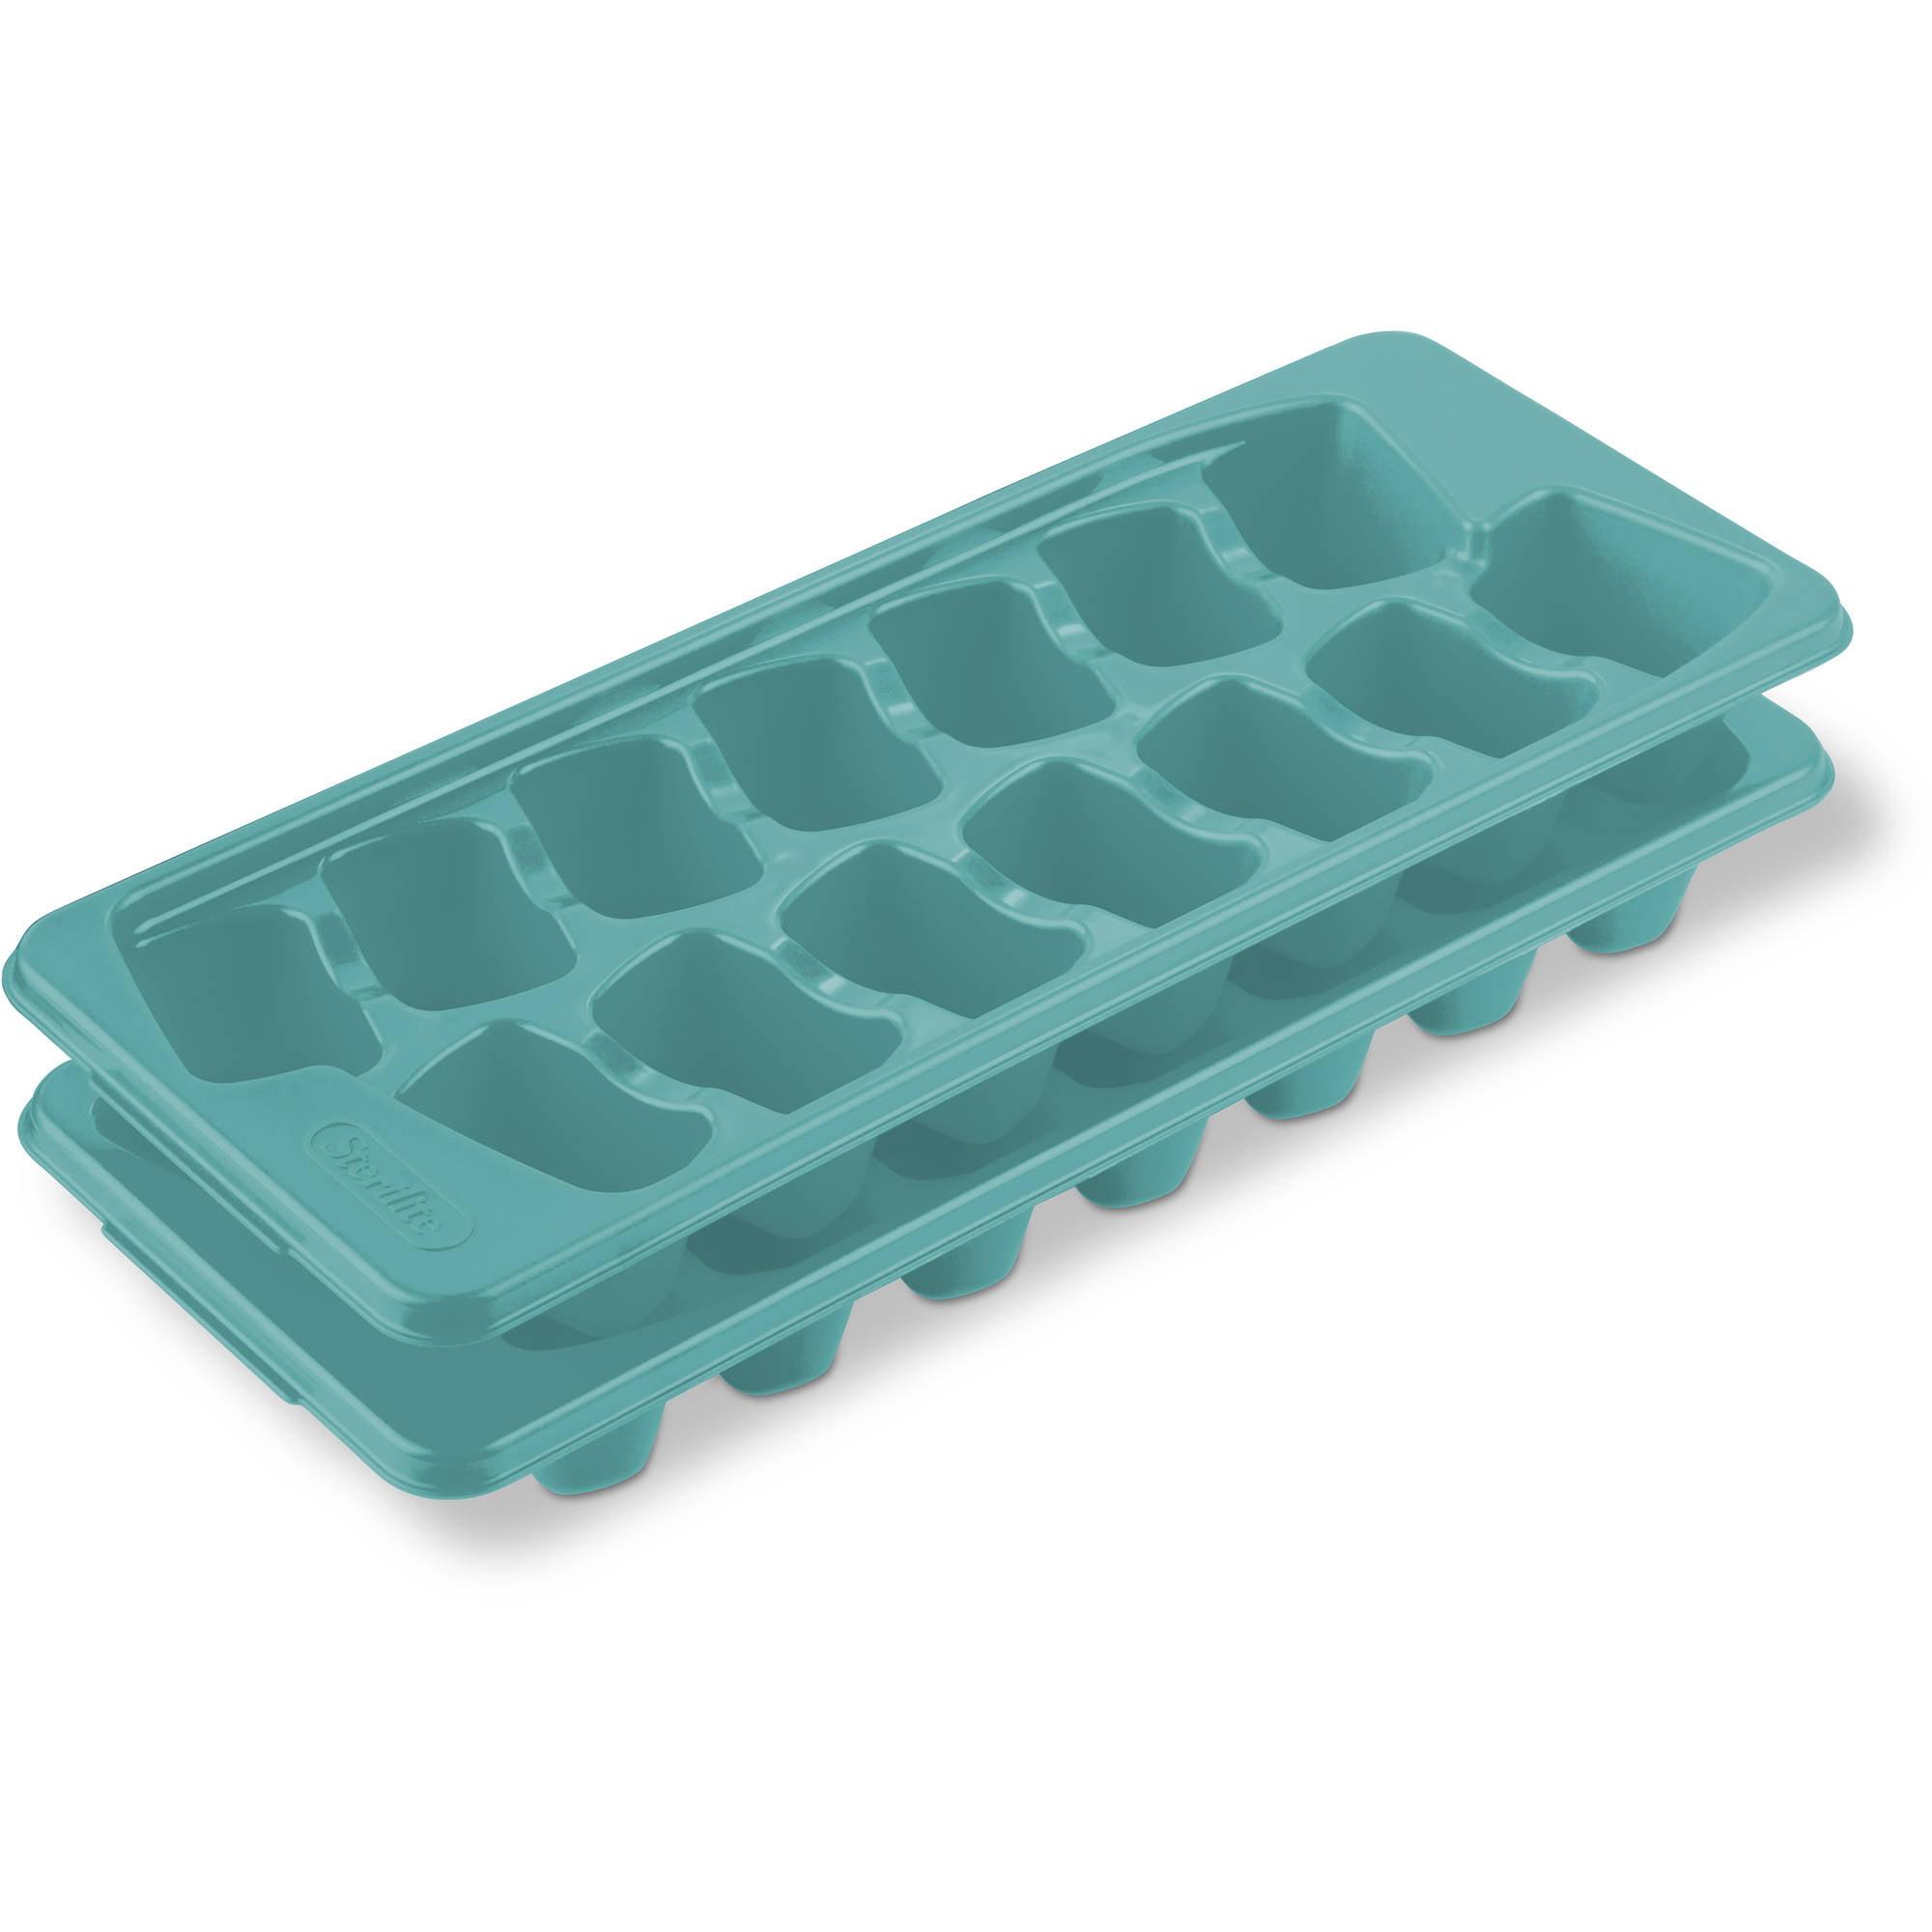 Sterilite Mainstays Ice Cube Trays, Blue Atoll, Set of 2